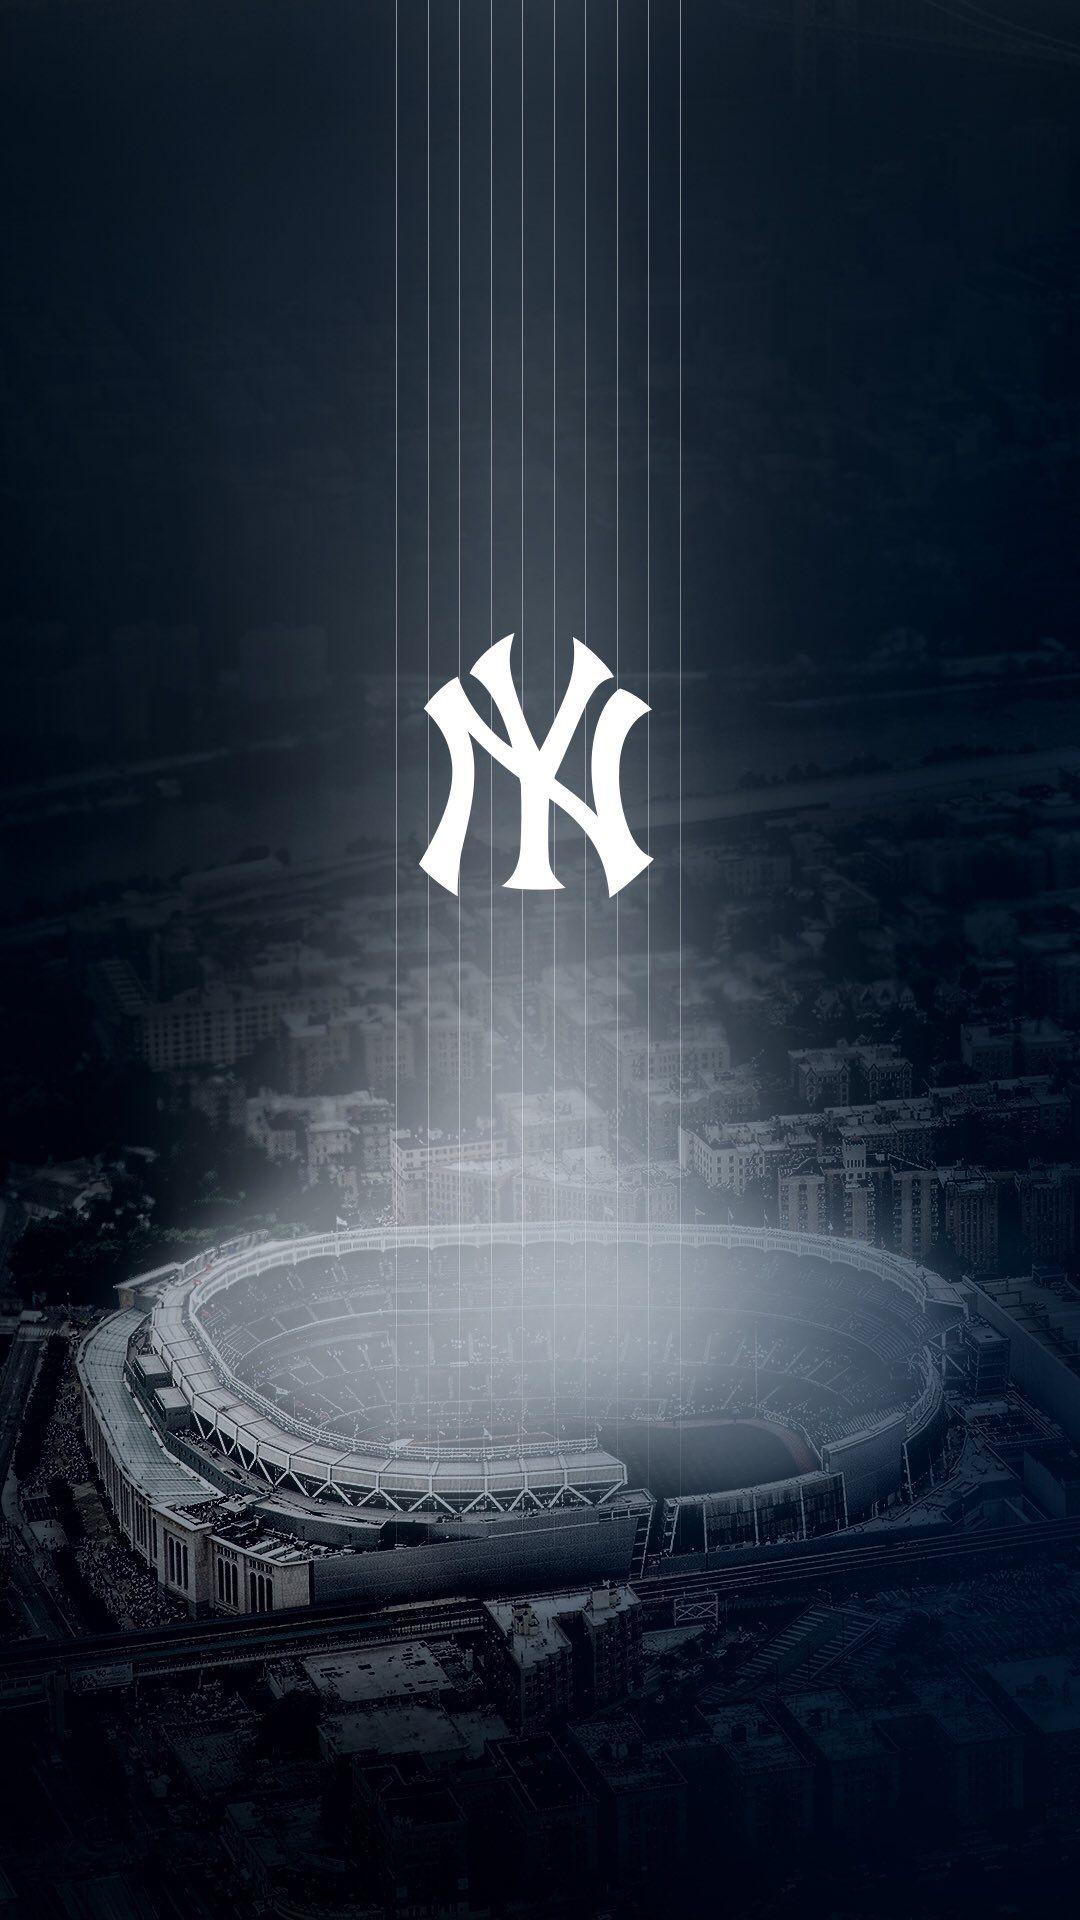 Pin By Maria Nimphius On New York Yankees With Images New York Yankees Stadium New York Yankees Baseball Yankees Poster